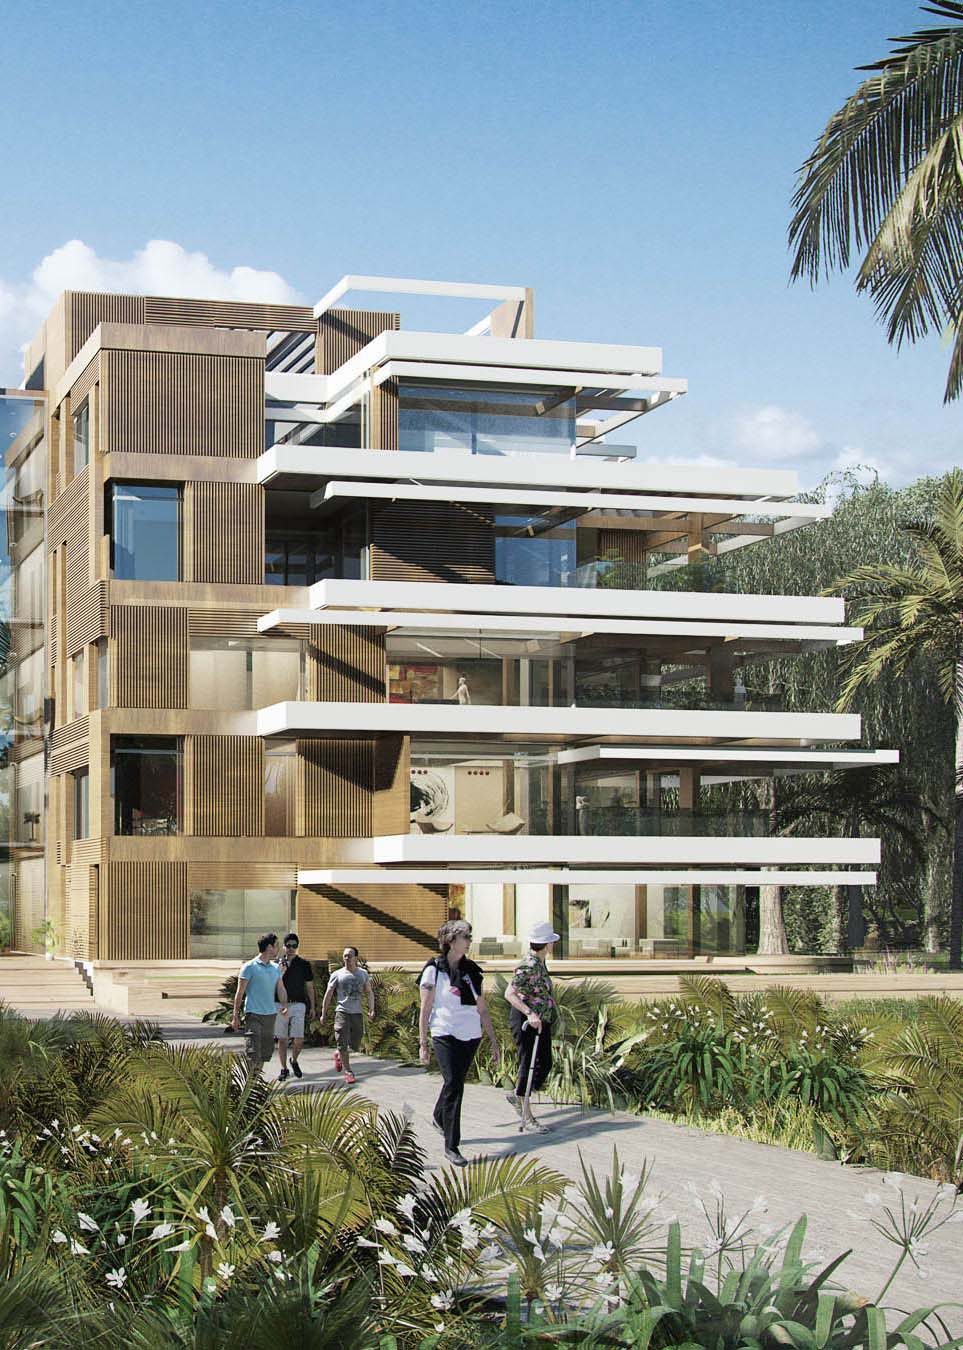 Al Barari Ashjar Apartments for Sale in Dubai